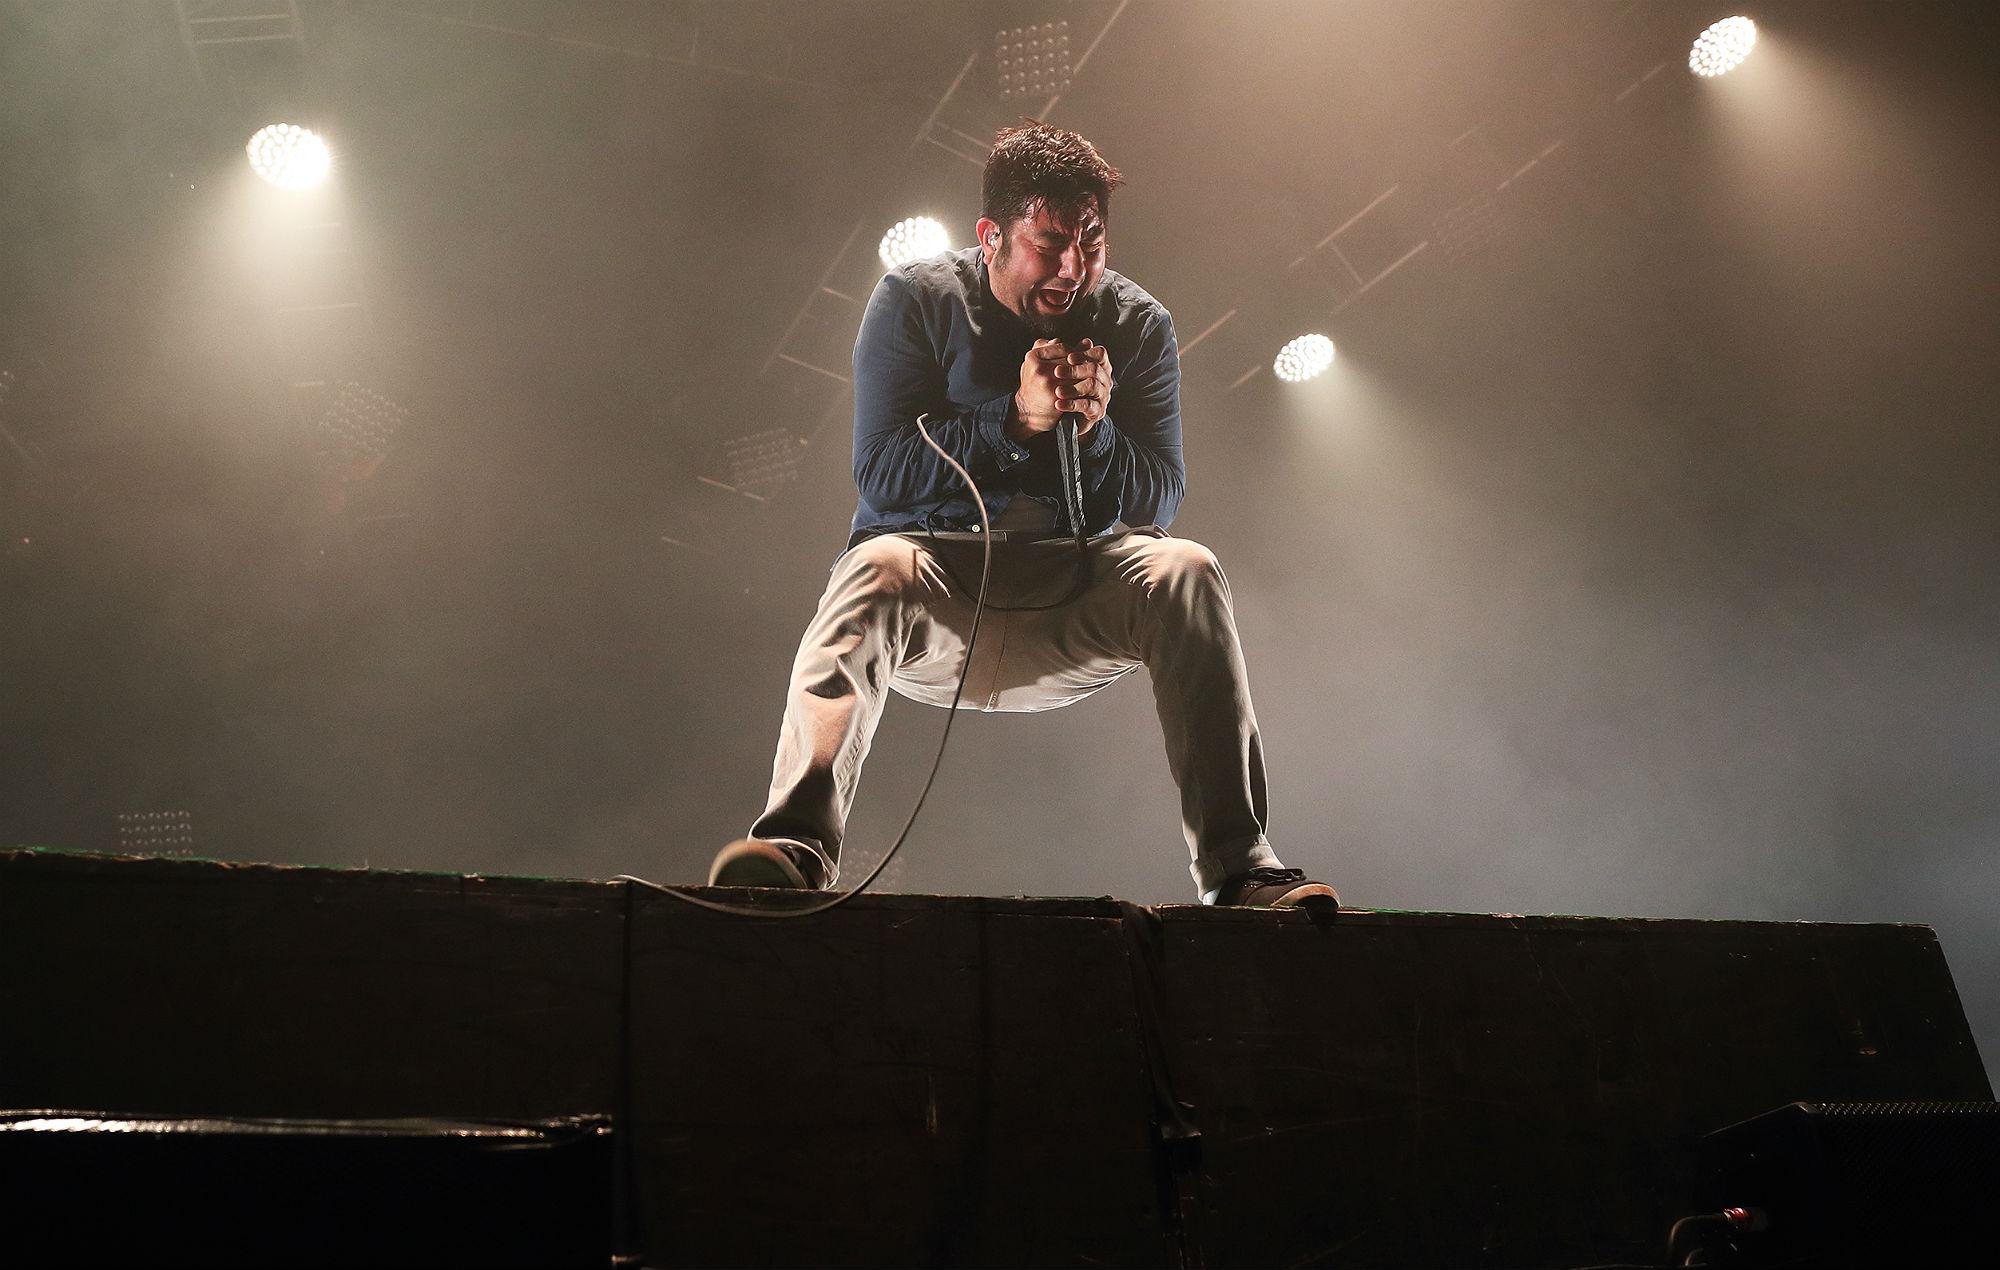 Chino Moreno of Deftones performs at Alexandra Palace on May 5, 2017 in London, England. (Photo by Burak Cingi/Redferns)